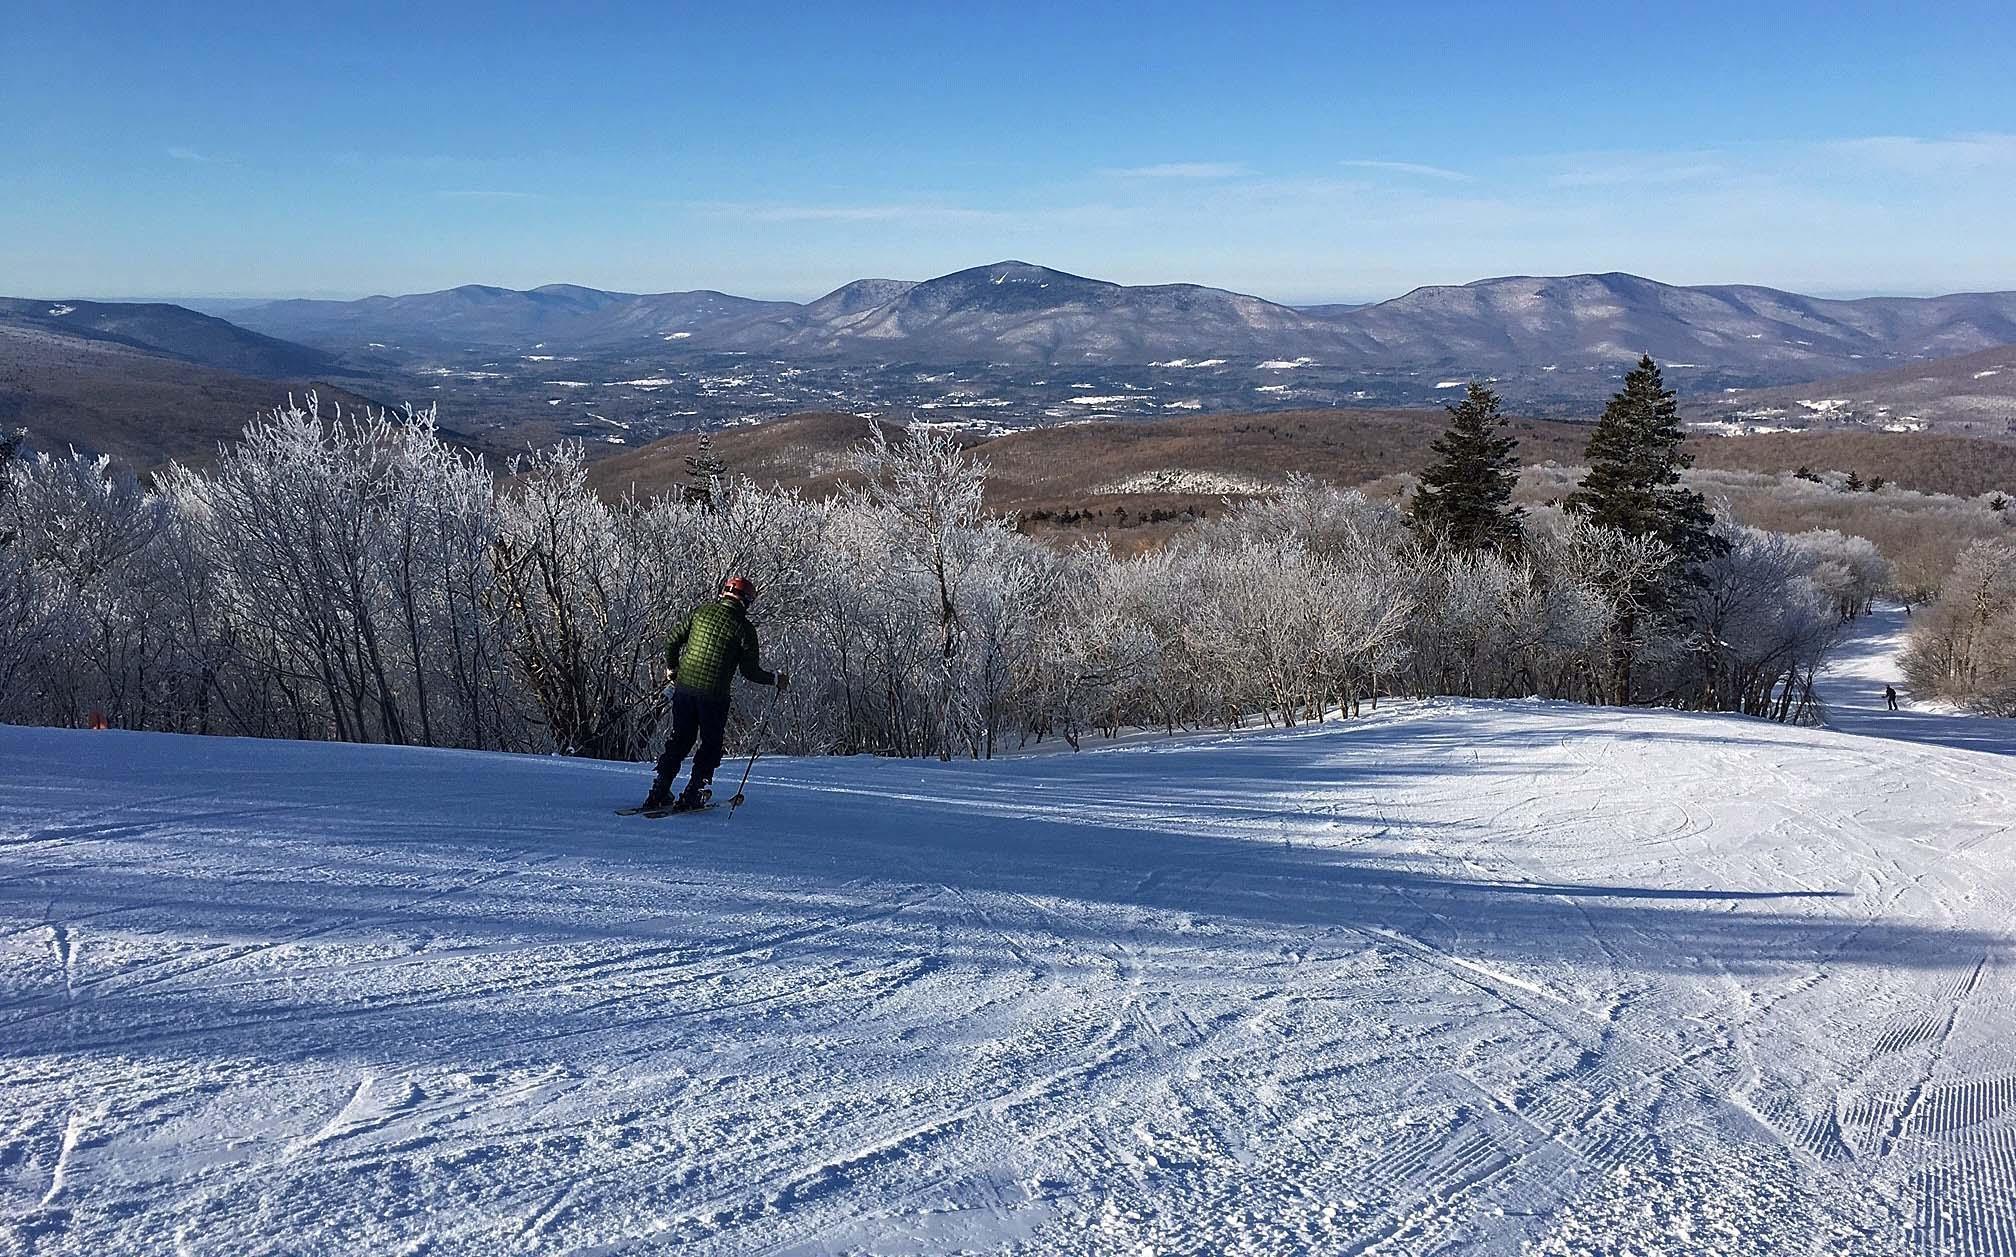 DOUBLE BLACK DIAMOND Ski at your own Risk SIGN Mountain Downhill Vintage Style